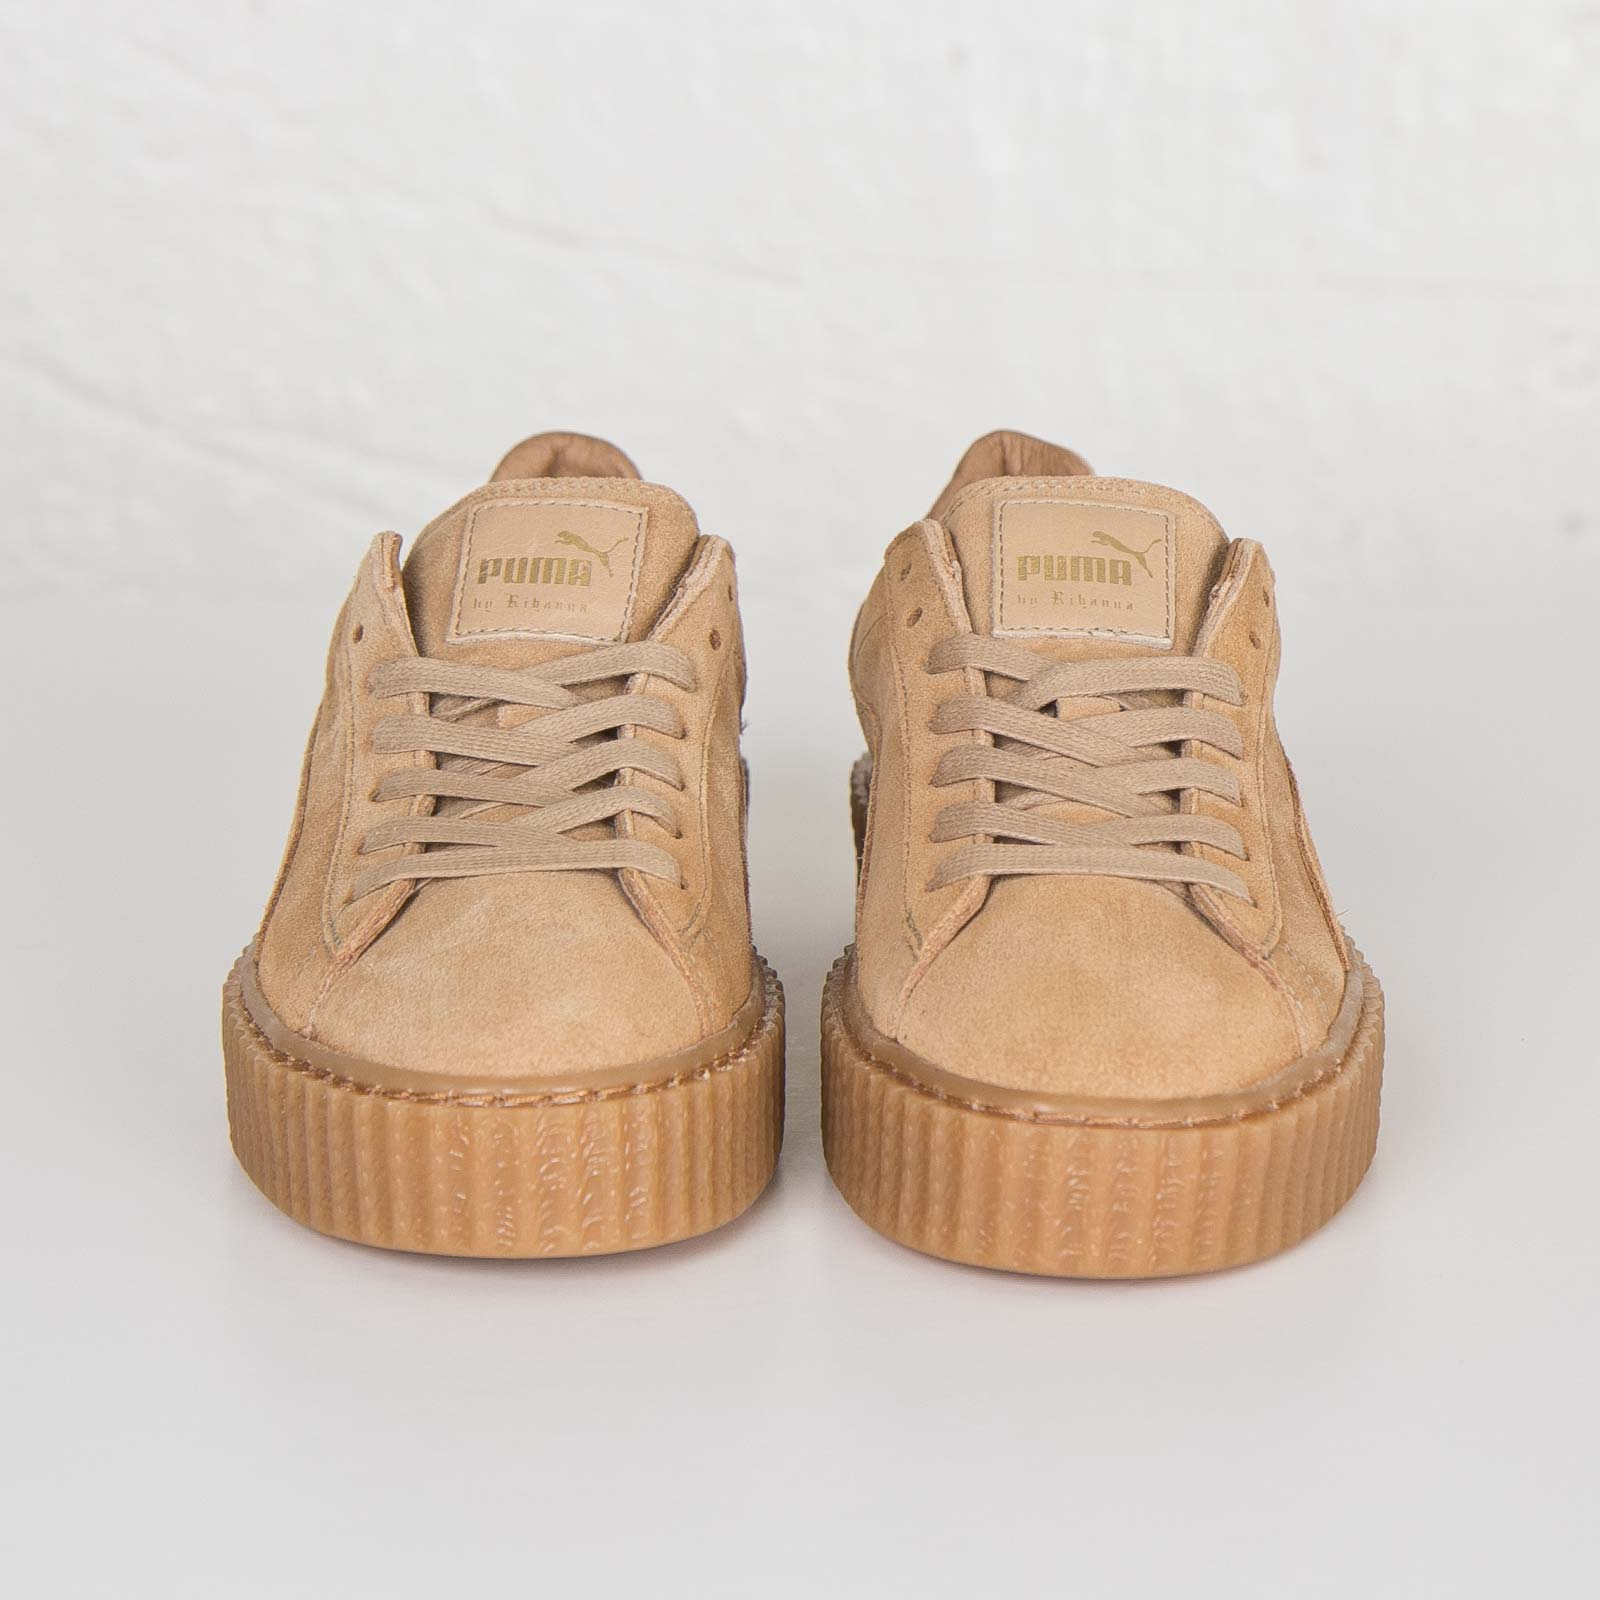 1cf2f3ebdcdc Puma Suede Creepers - 361005-03 - Sneakersnstuff